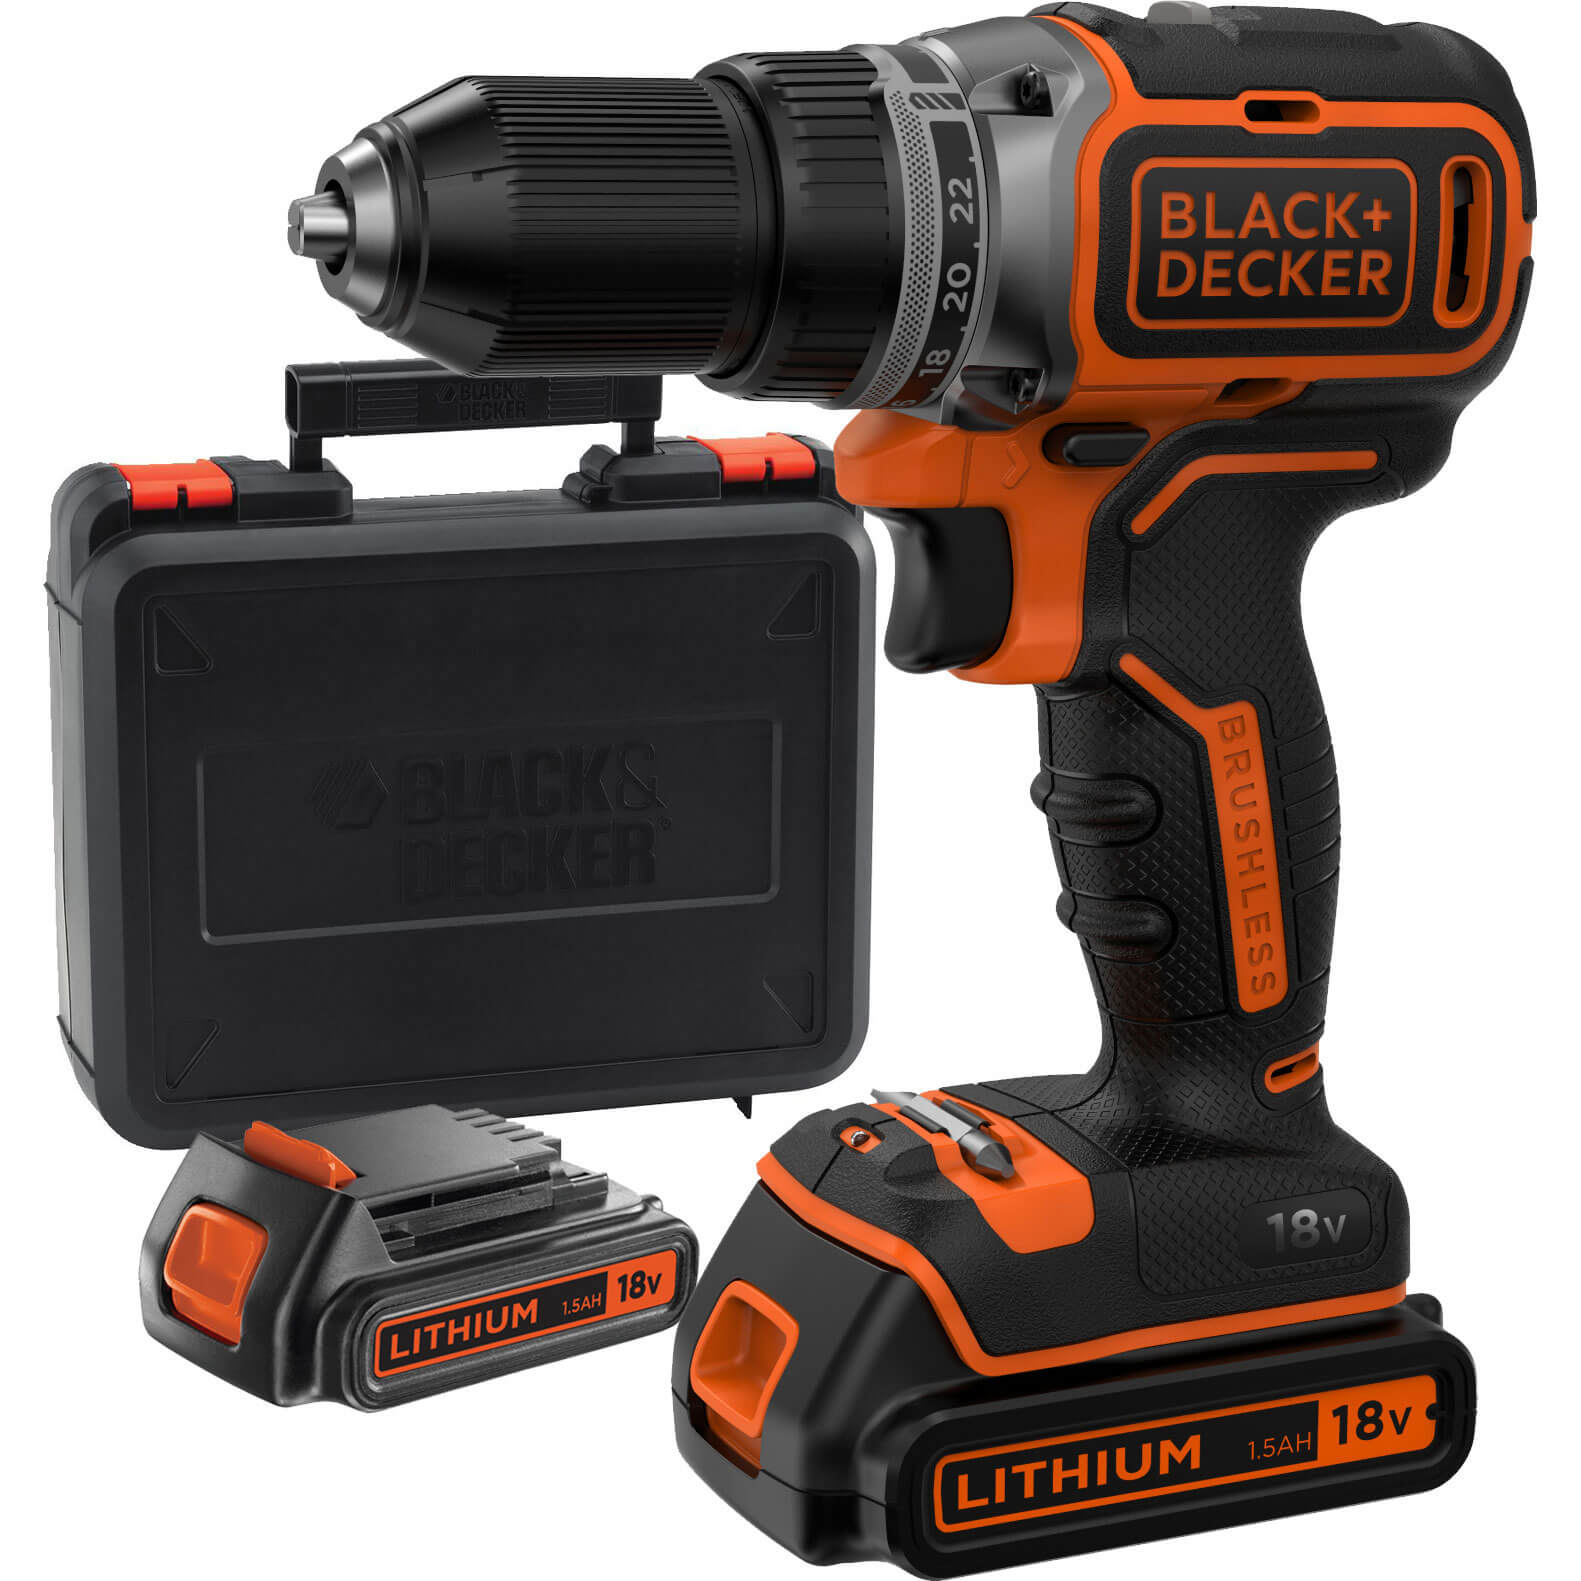 Black & Decker BL186 18v Cordless Drill Driver 2 x 1.5ah Liion Charger Case